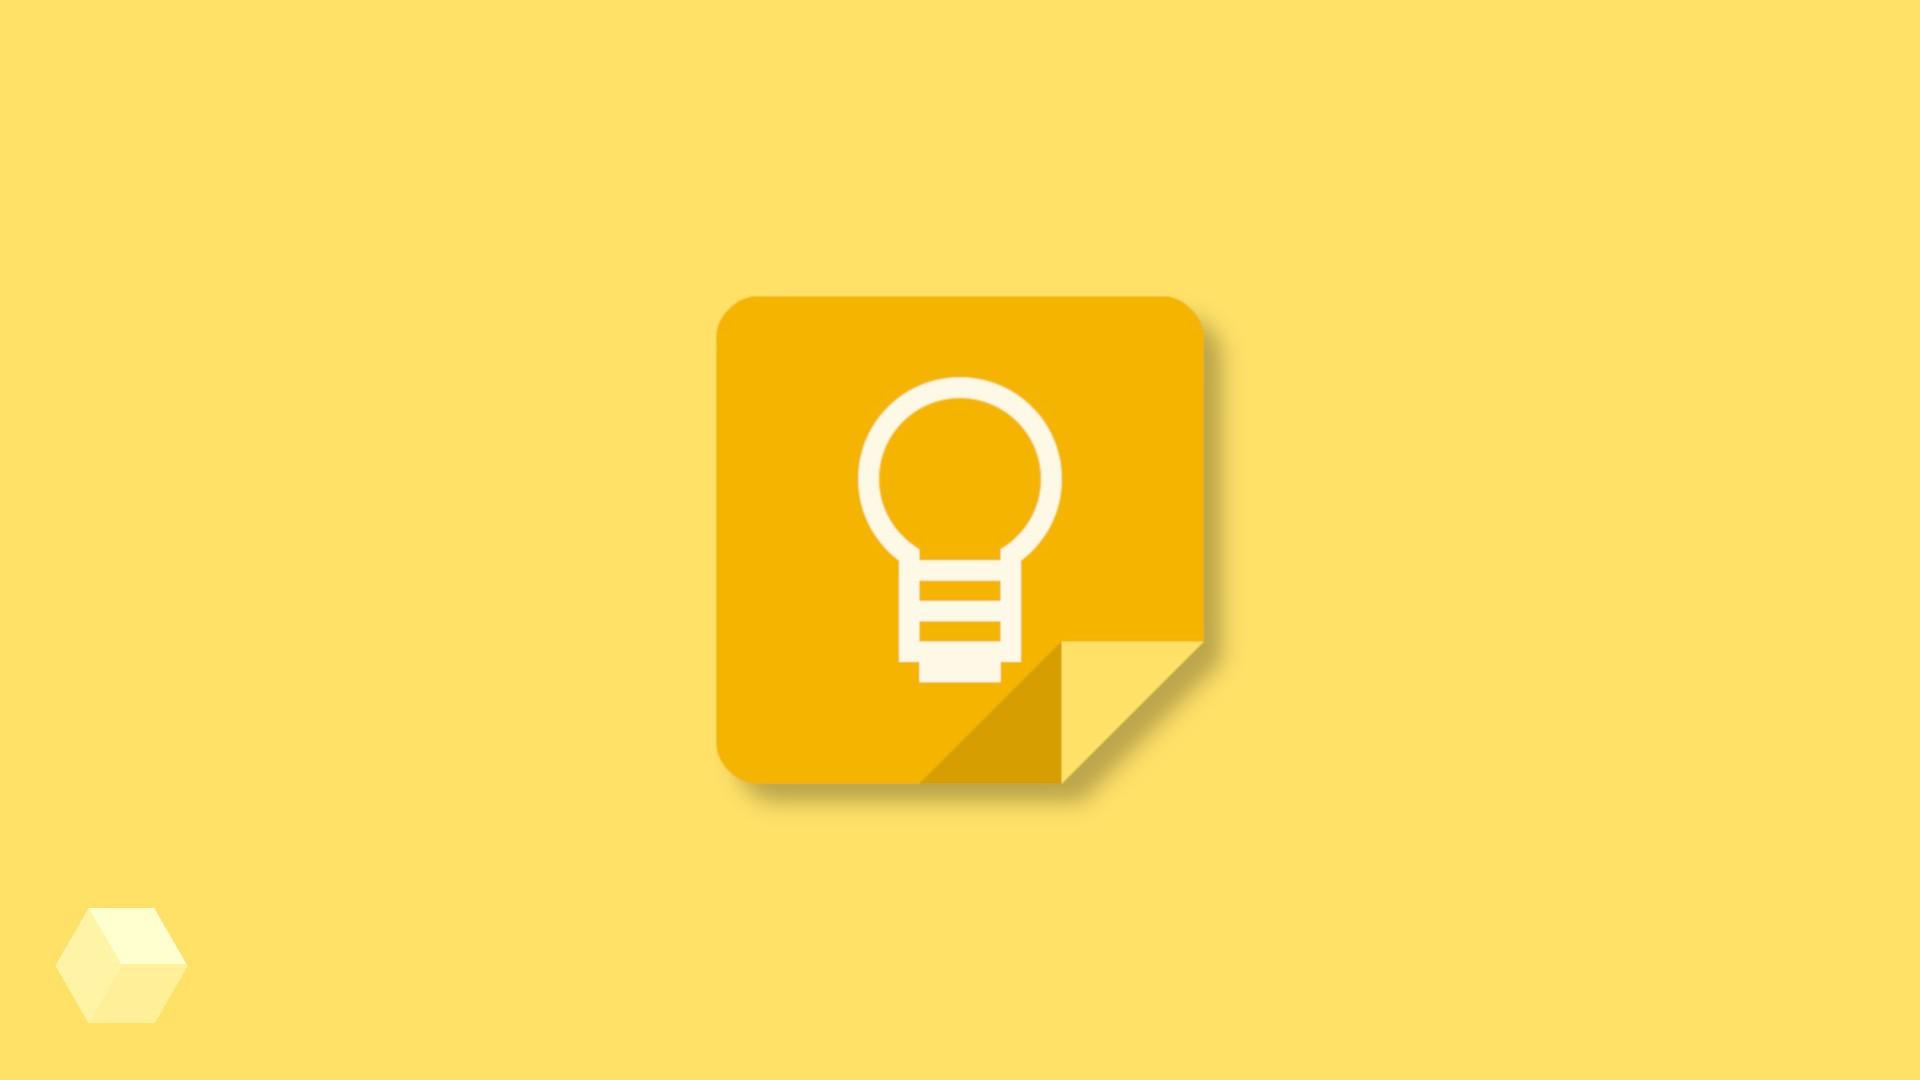 Google обновила дизайн менеджера заметок Keep